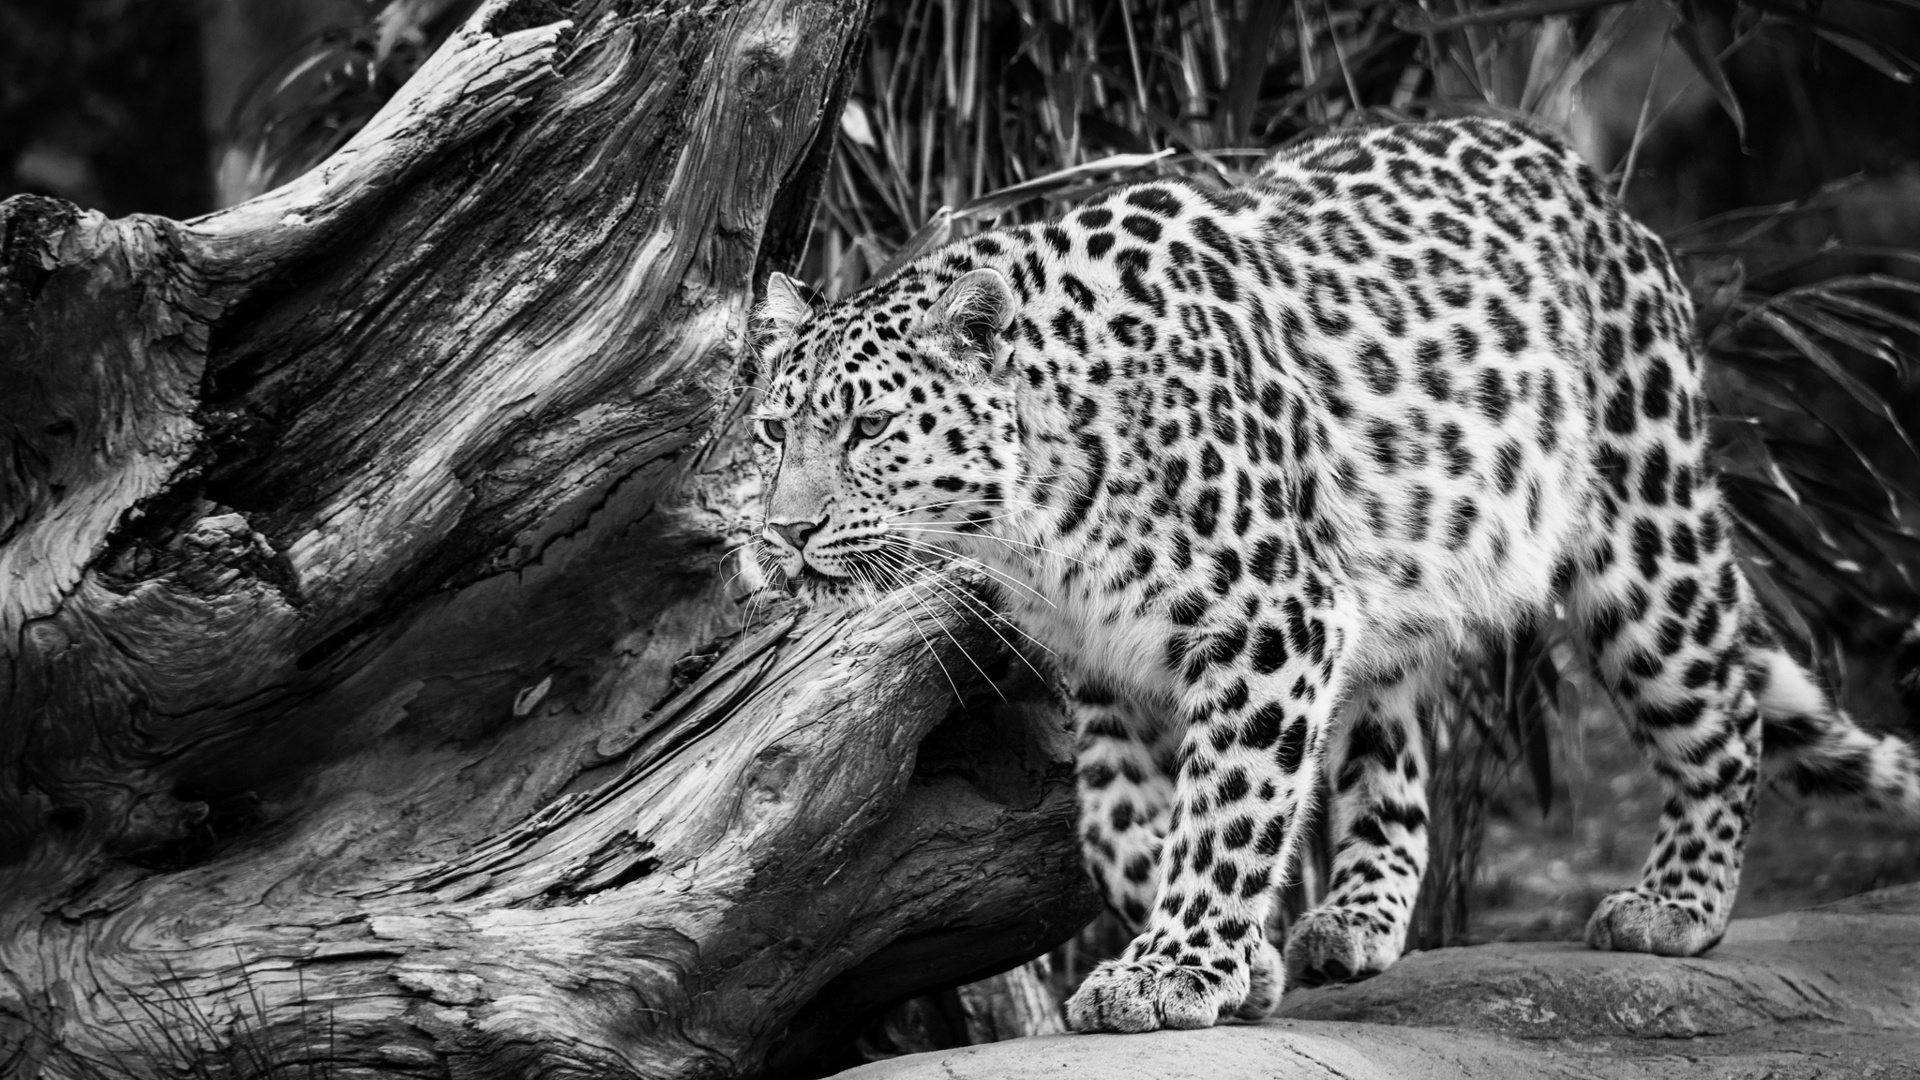 Leopard Skin clipart lepard #5